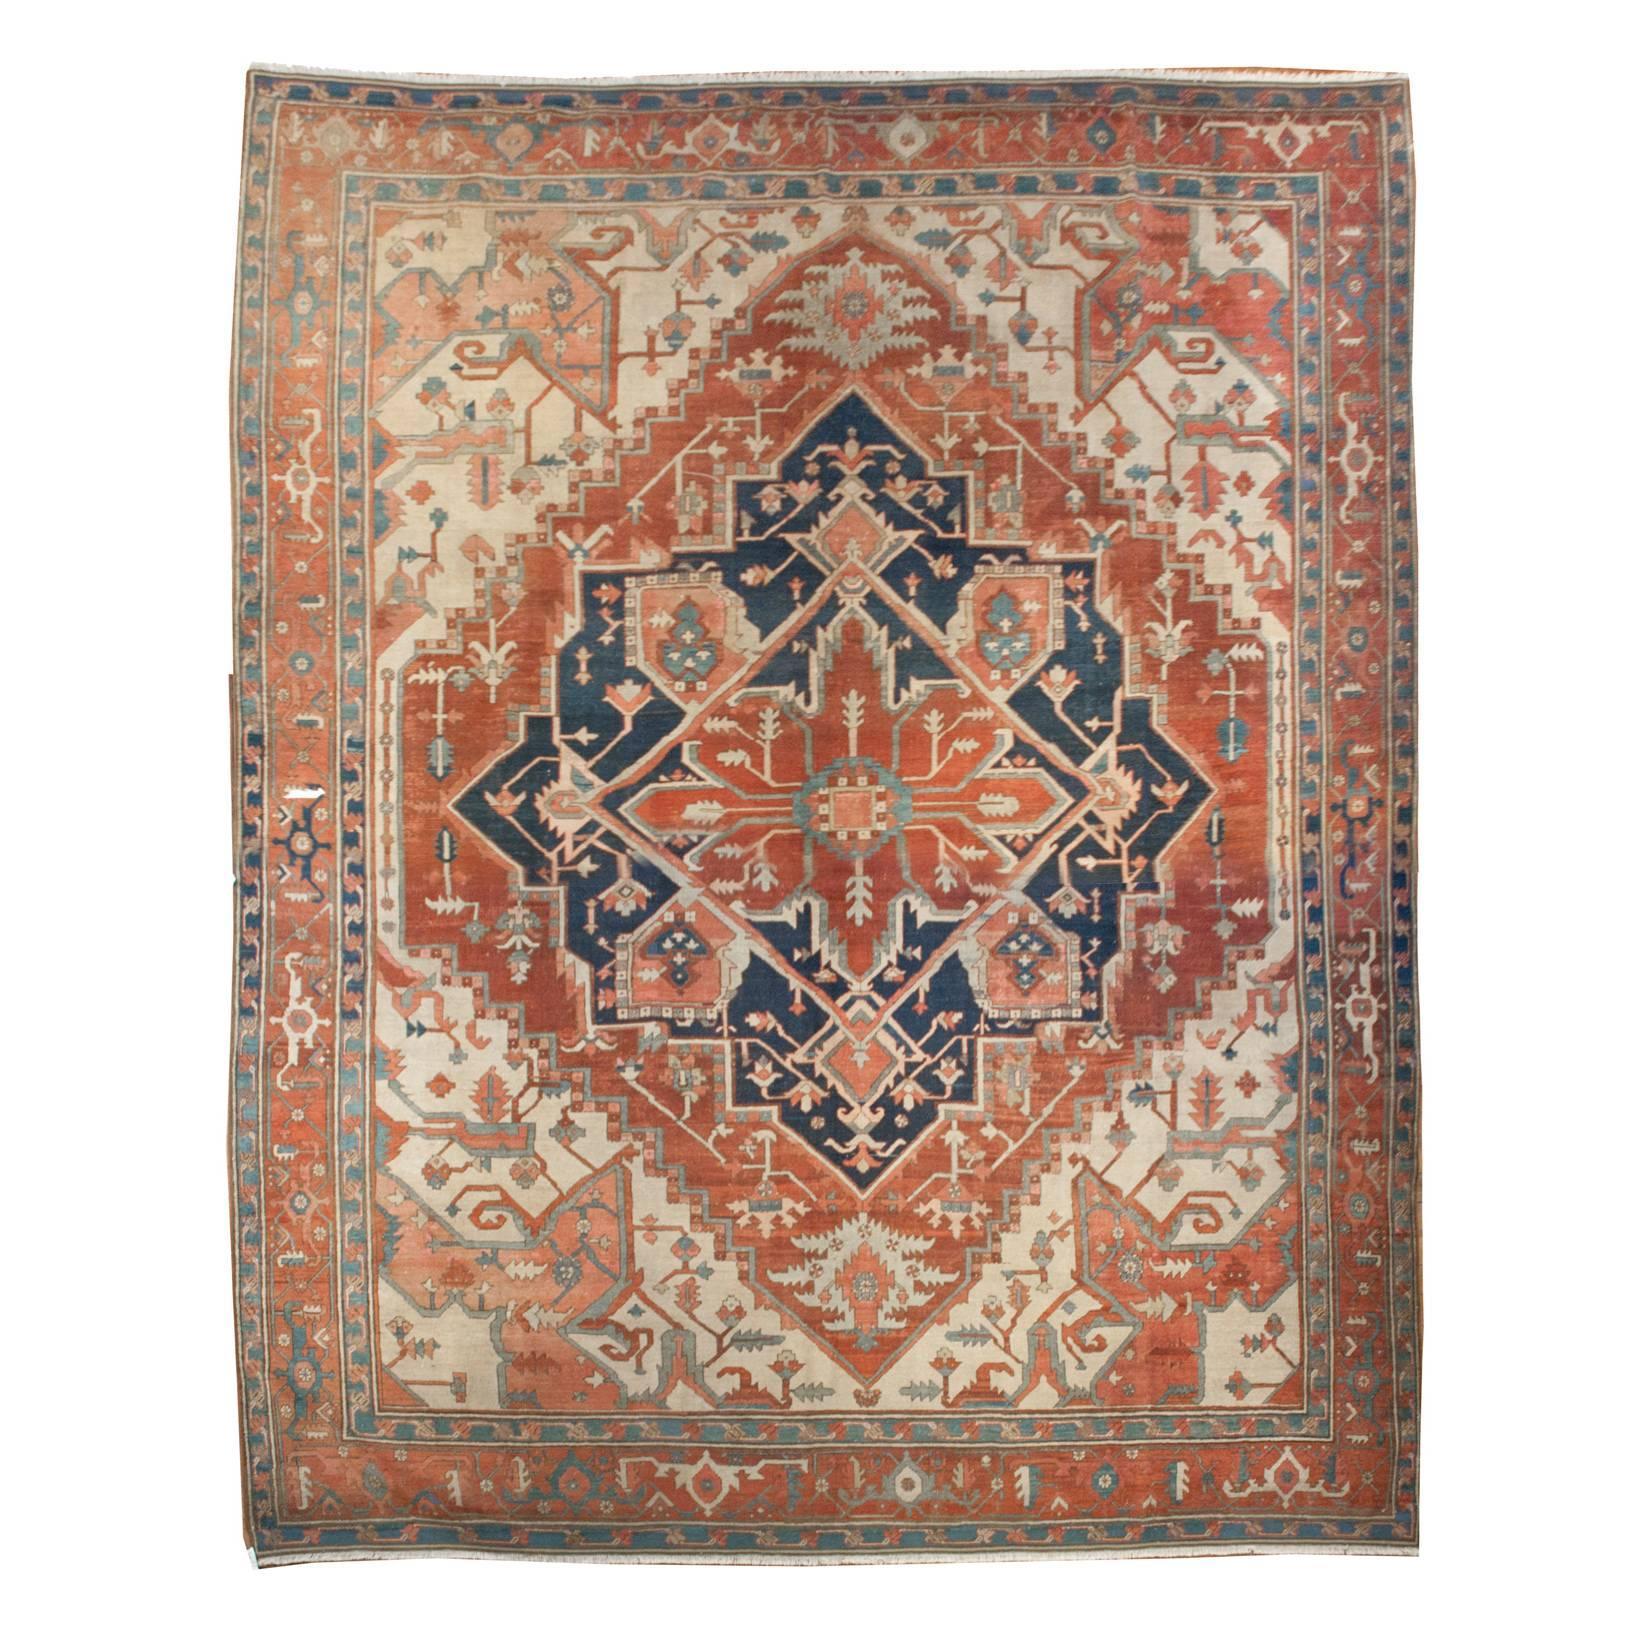 19th Century Serapi Rug